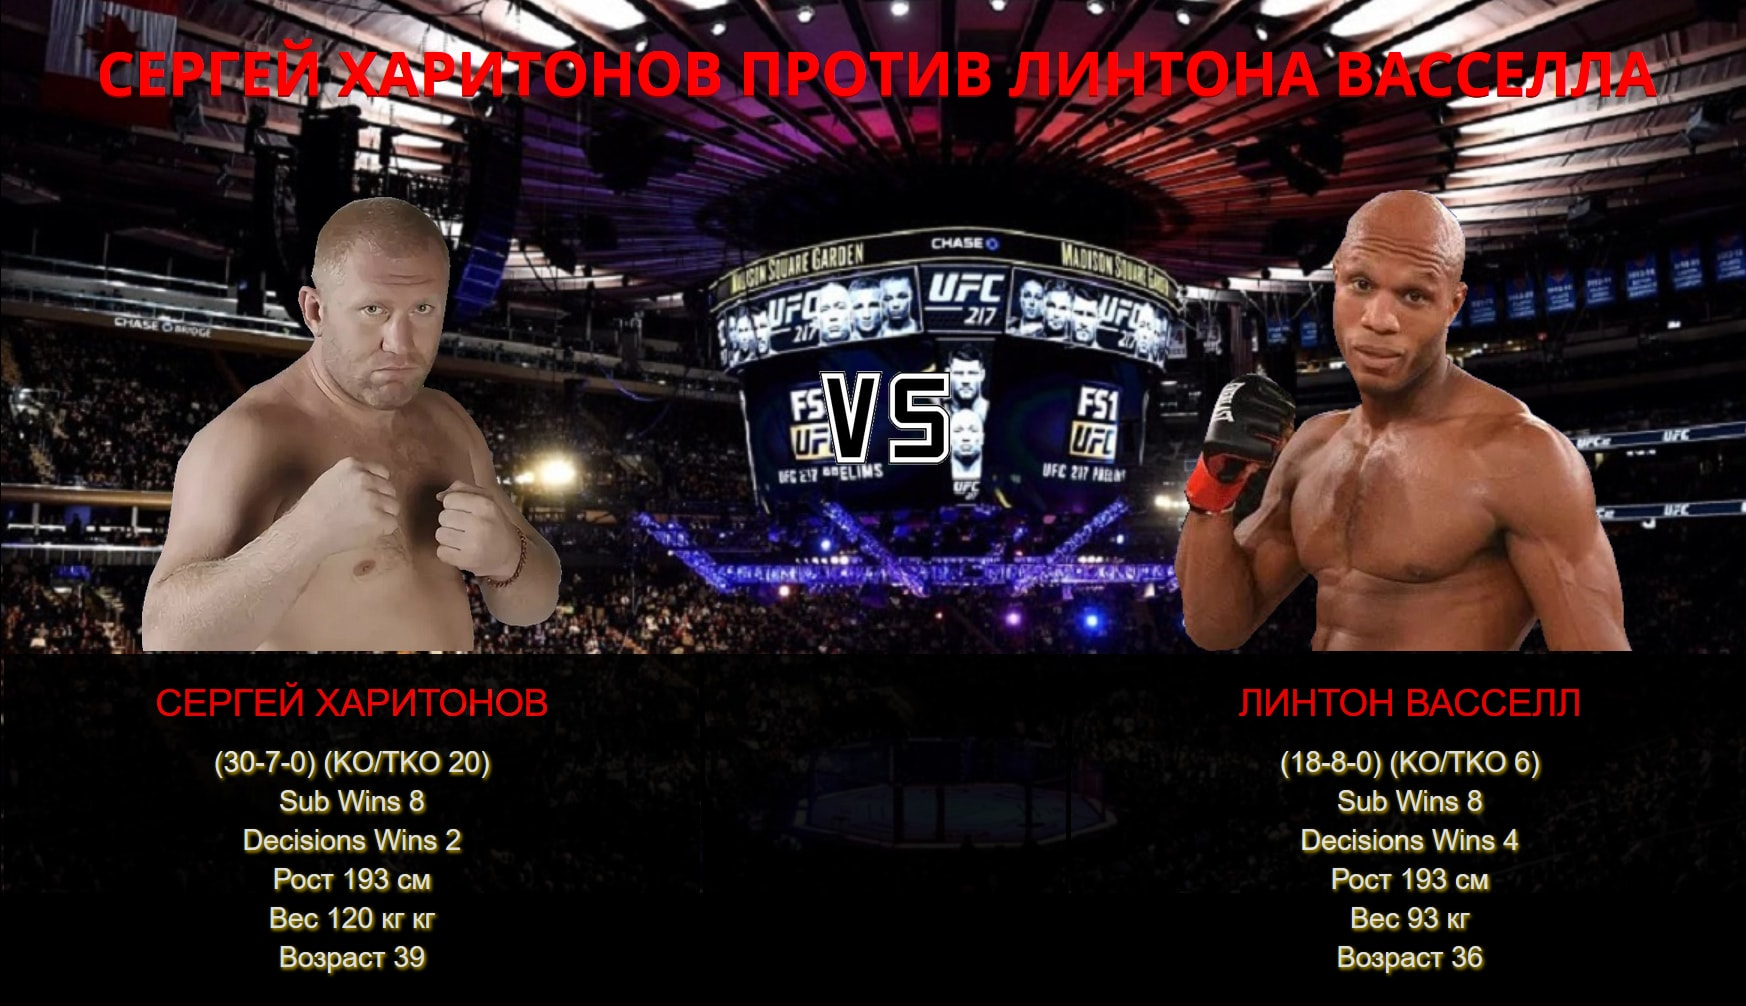 Сергей Харитонов - Линтон Васселл